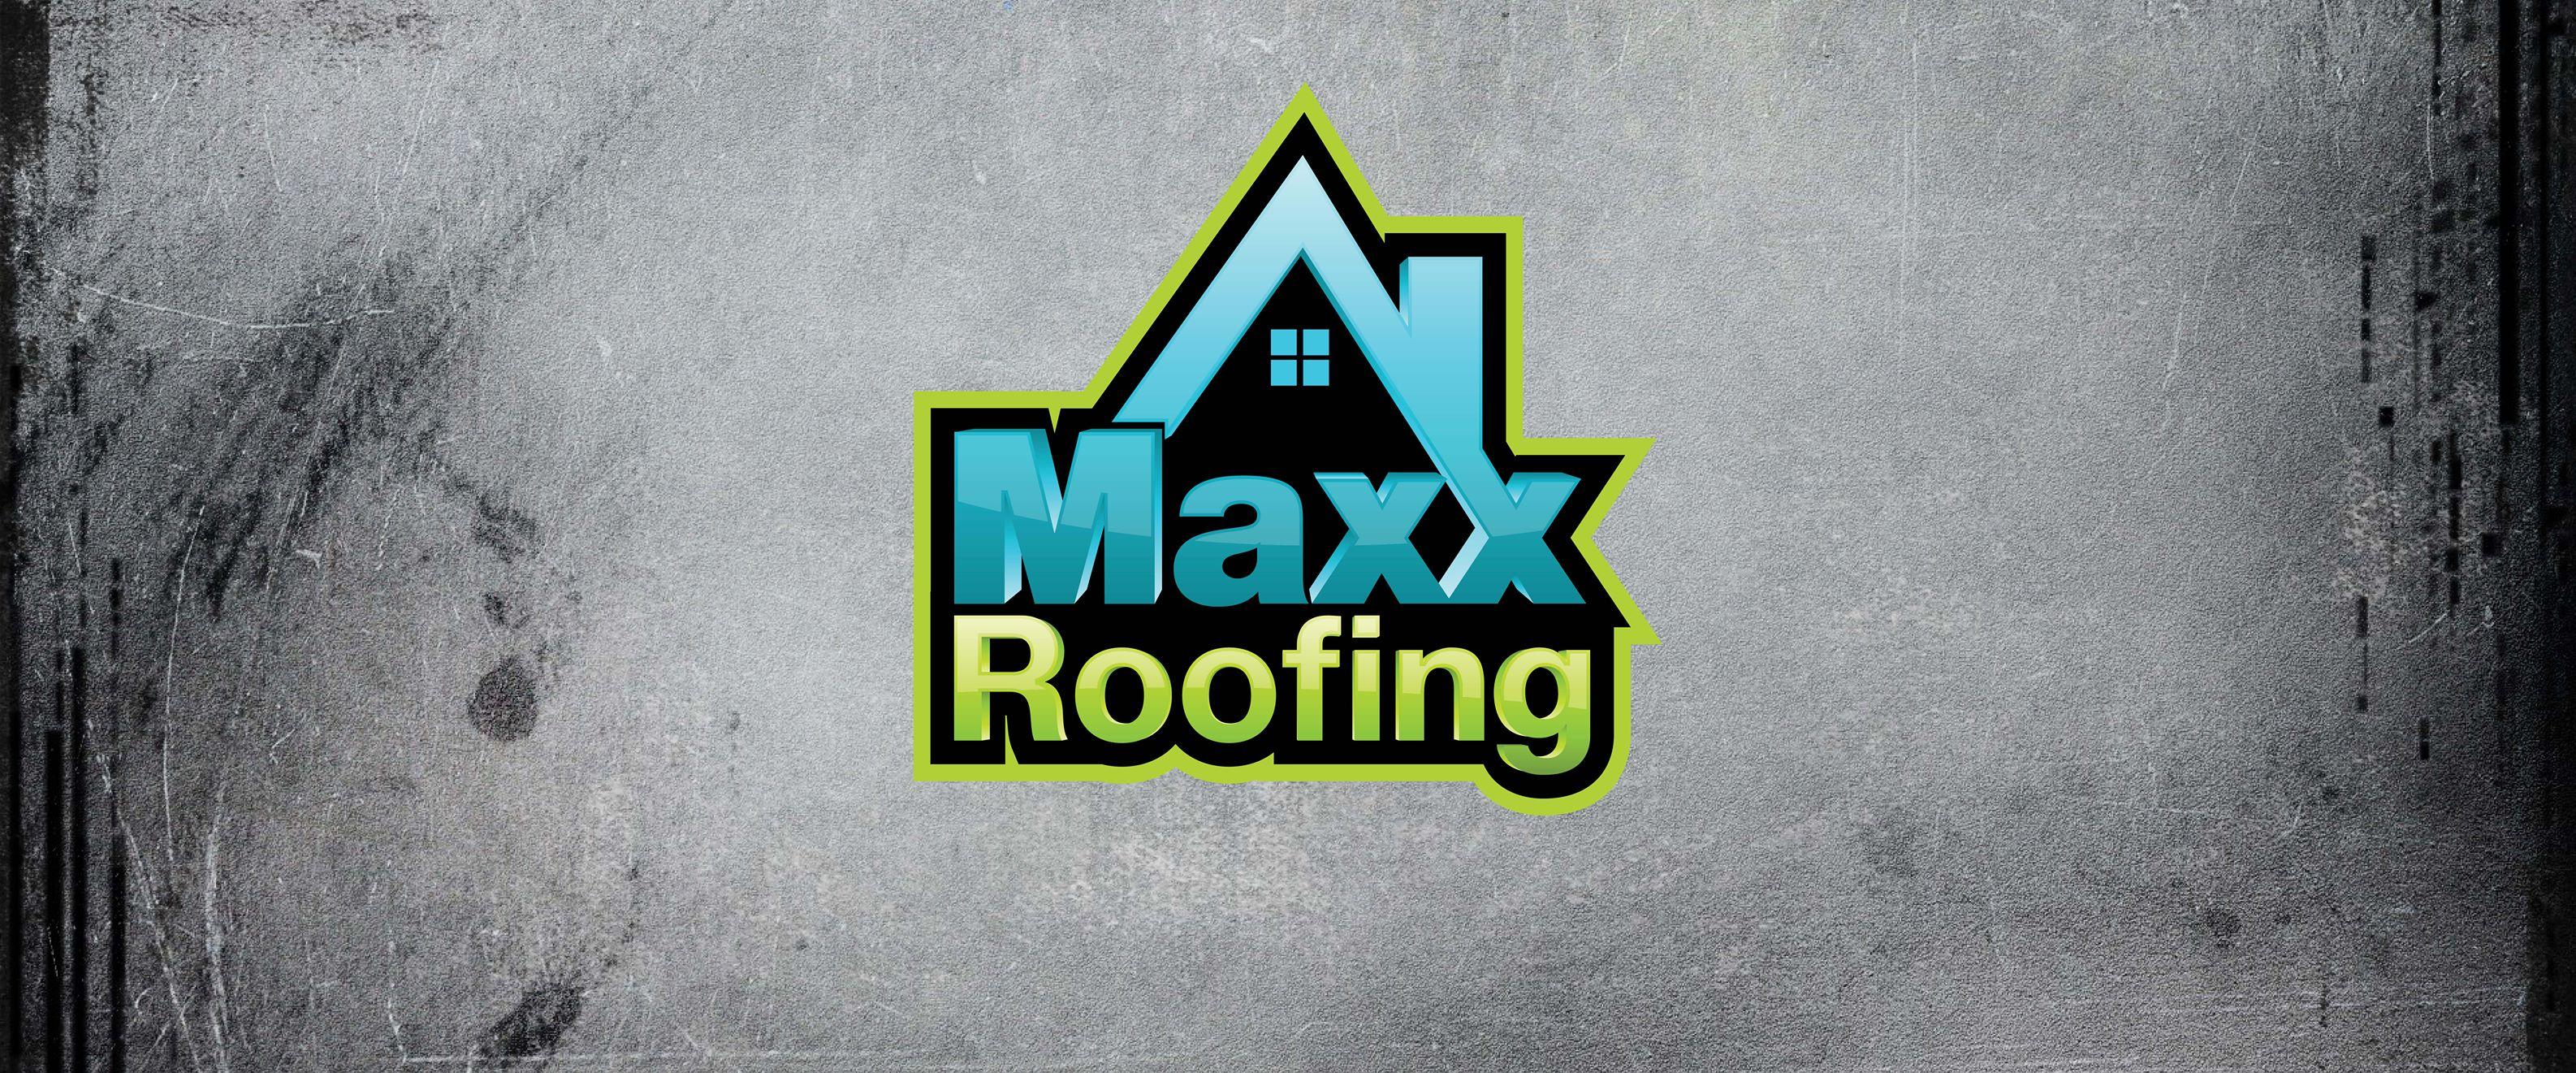 Maxx Roofing reviews | Siding at 2013 S Elm Pl - Broken Arrow OK